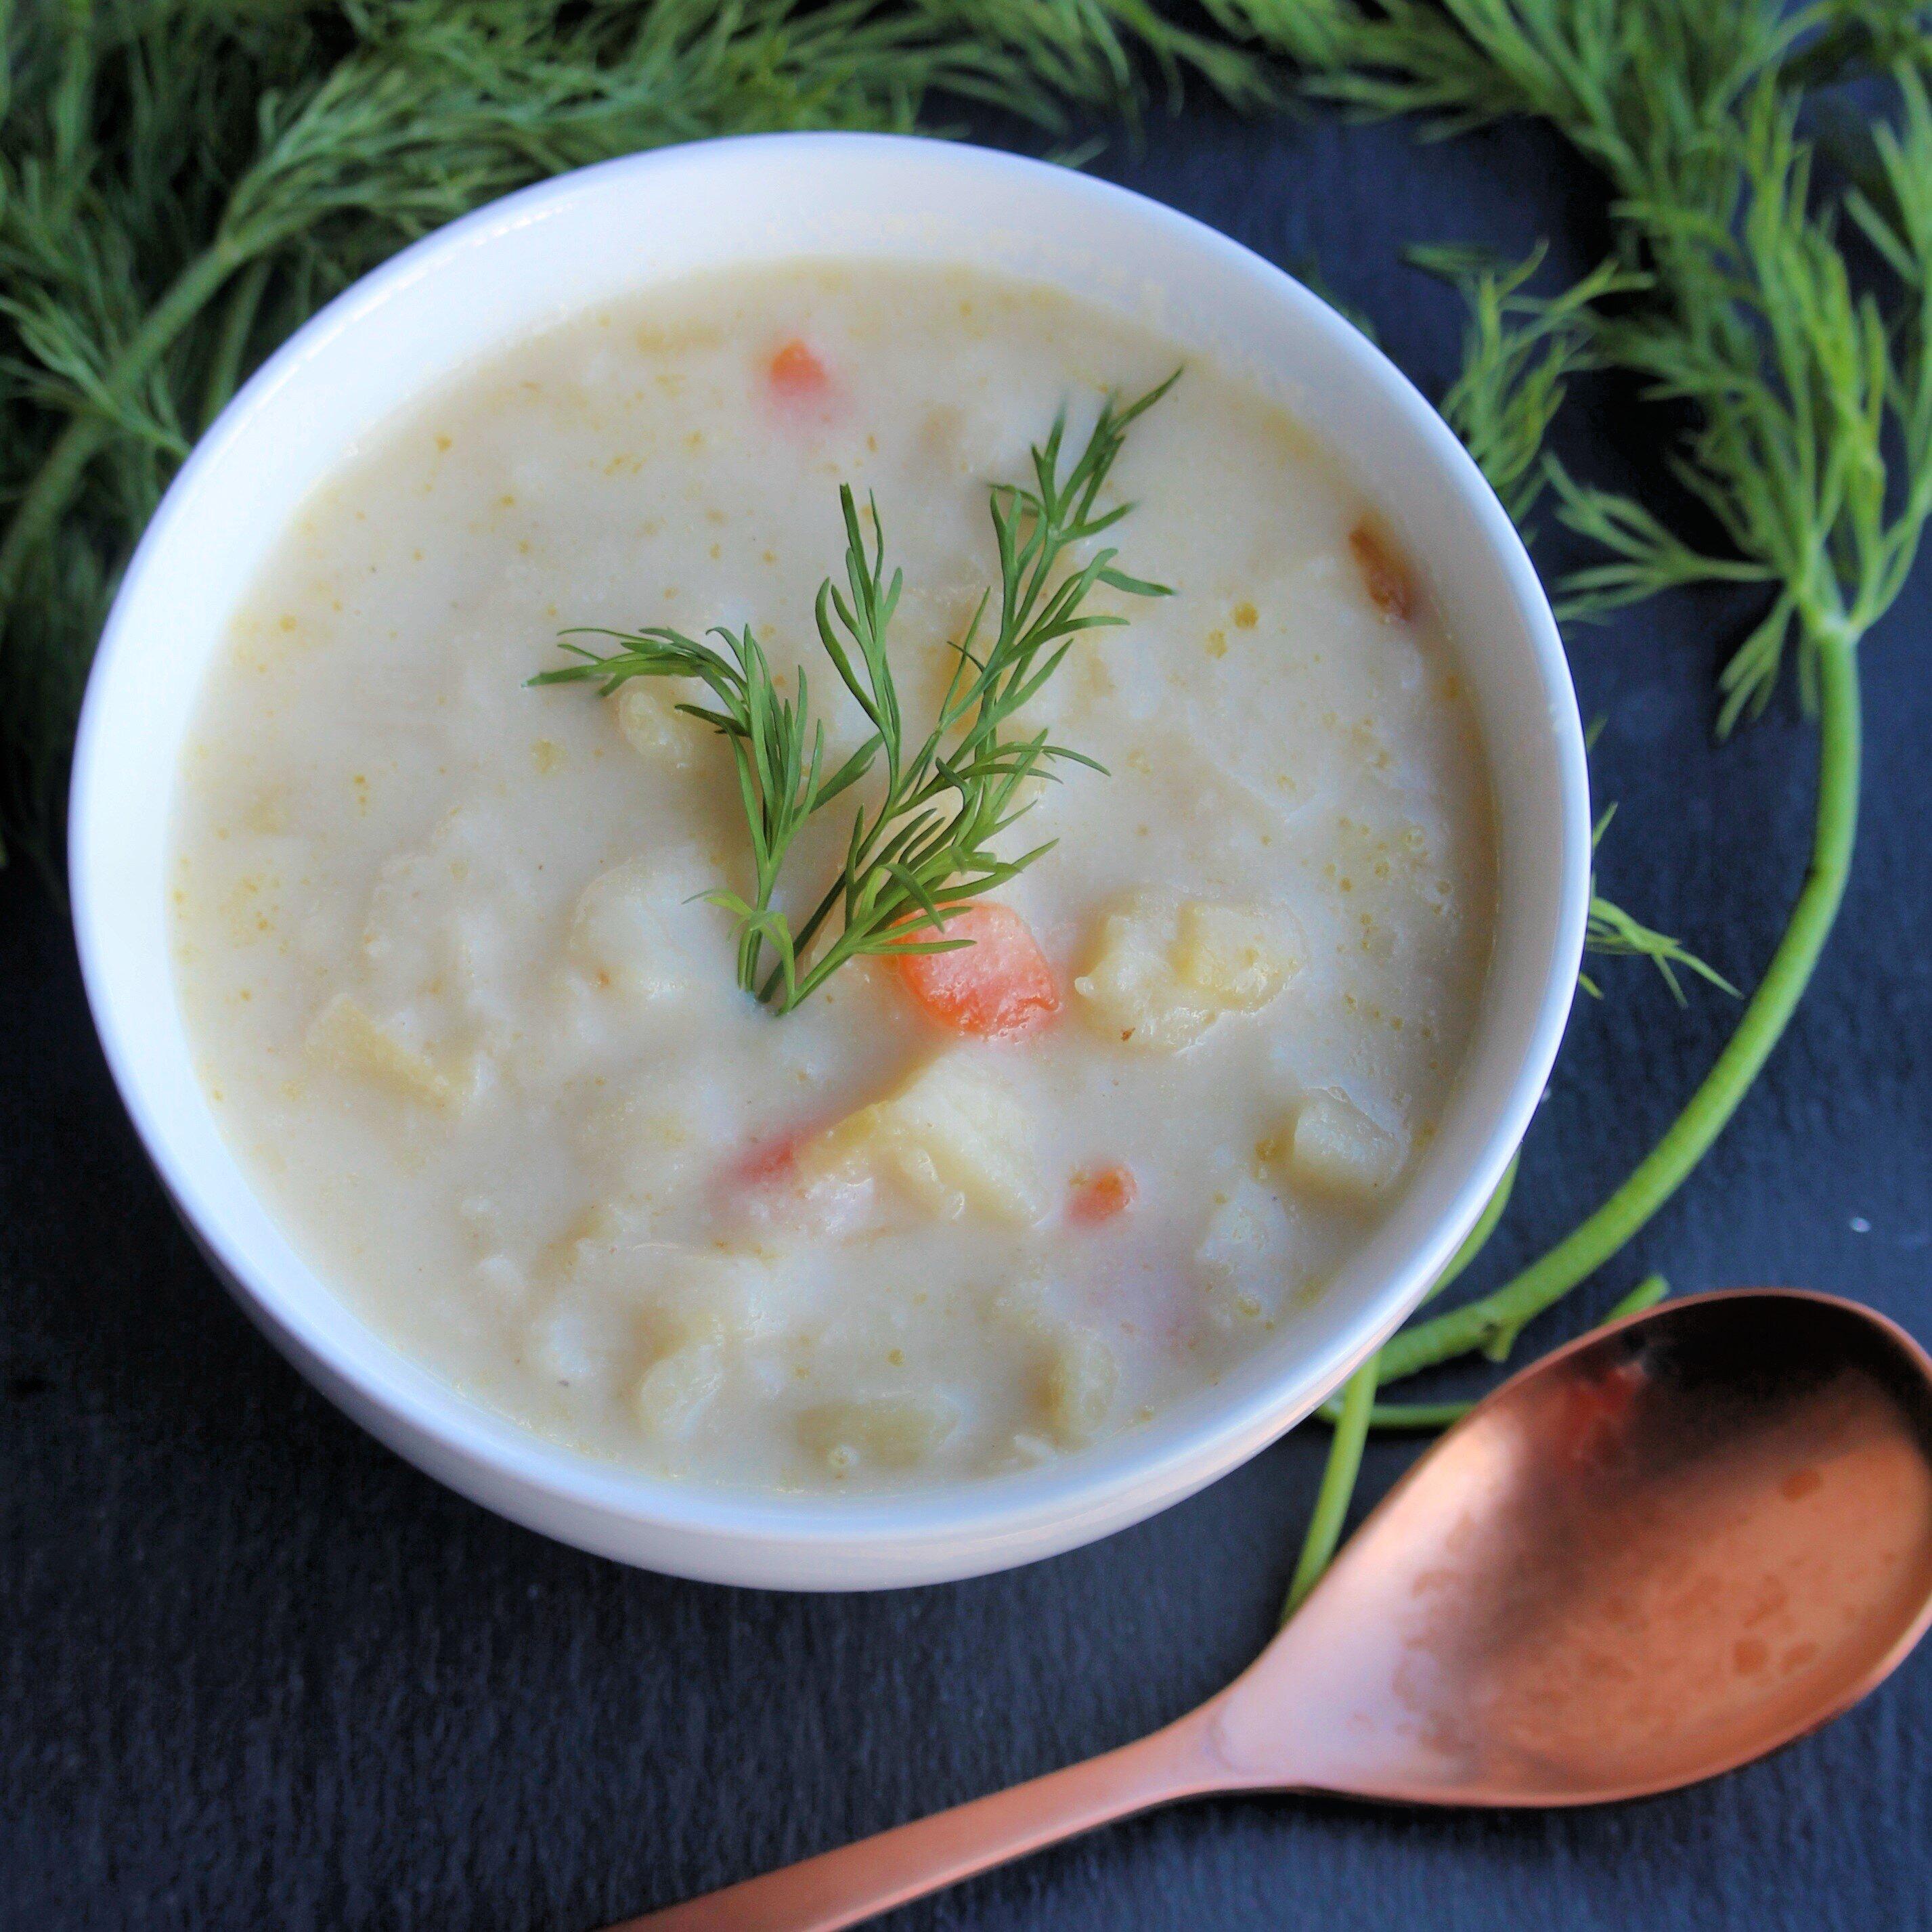 slow cooker vegan leek and potato soup recipe